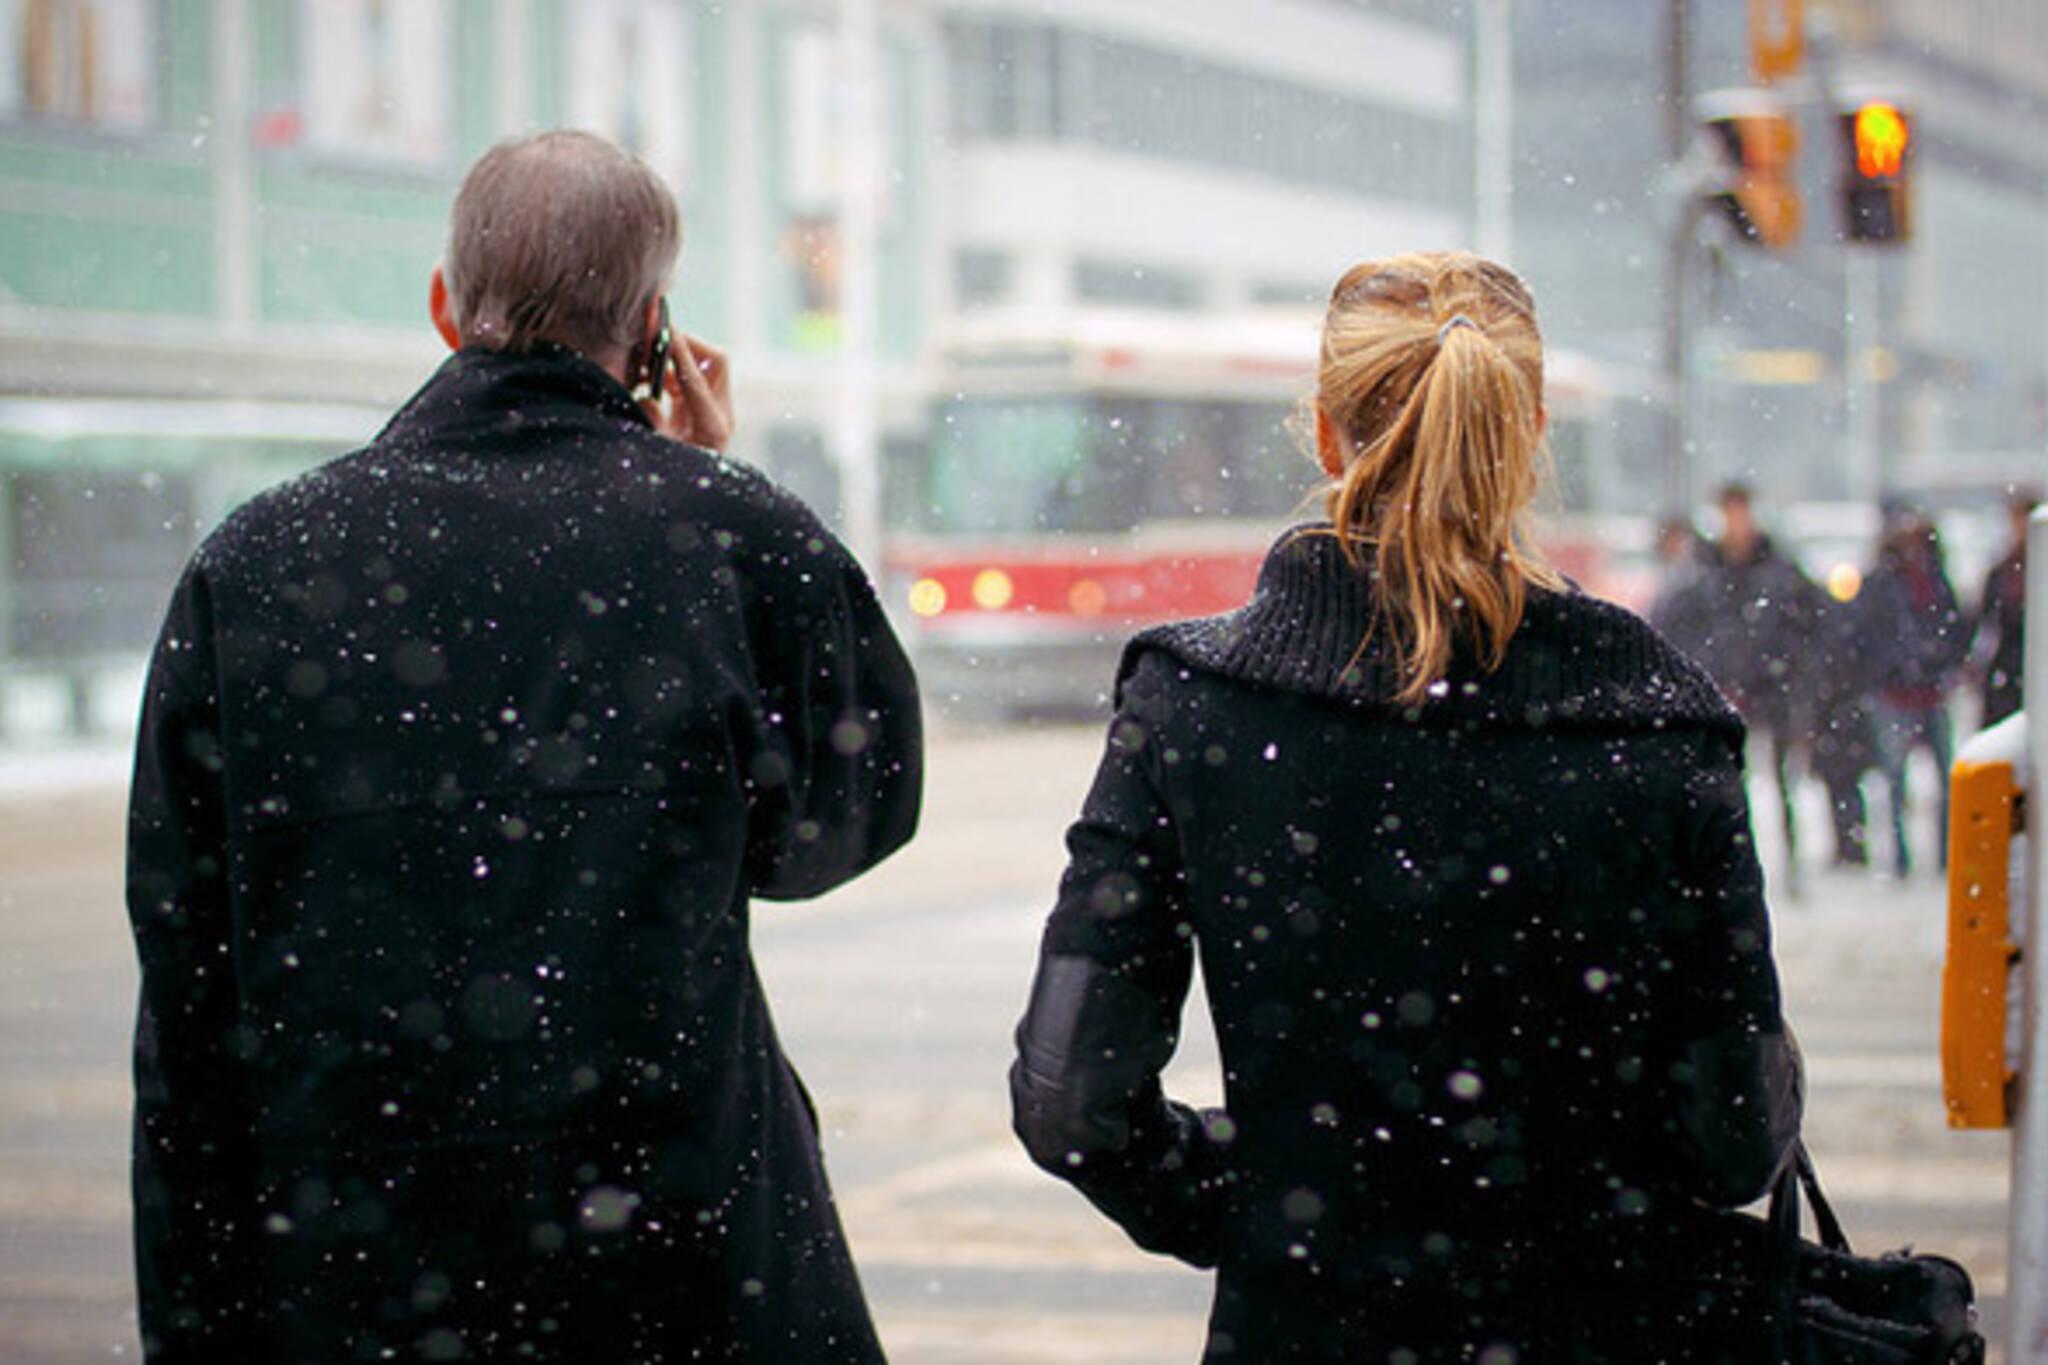 Toronto pedestrians